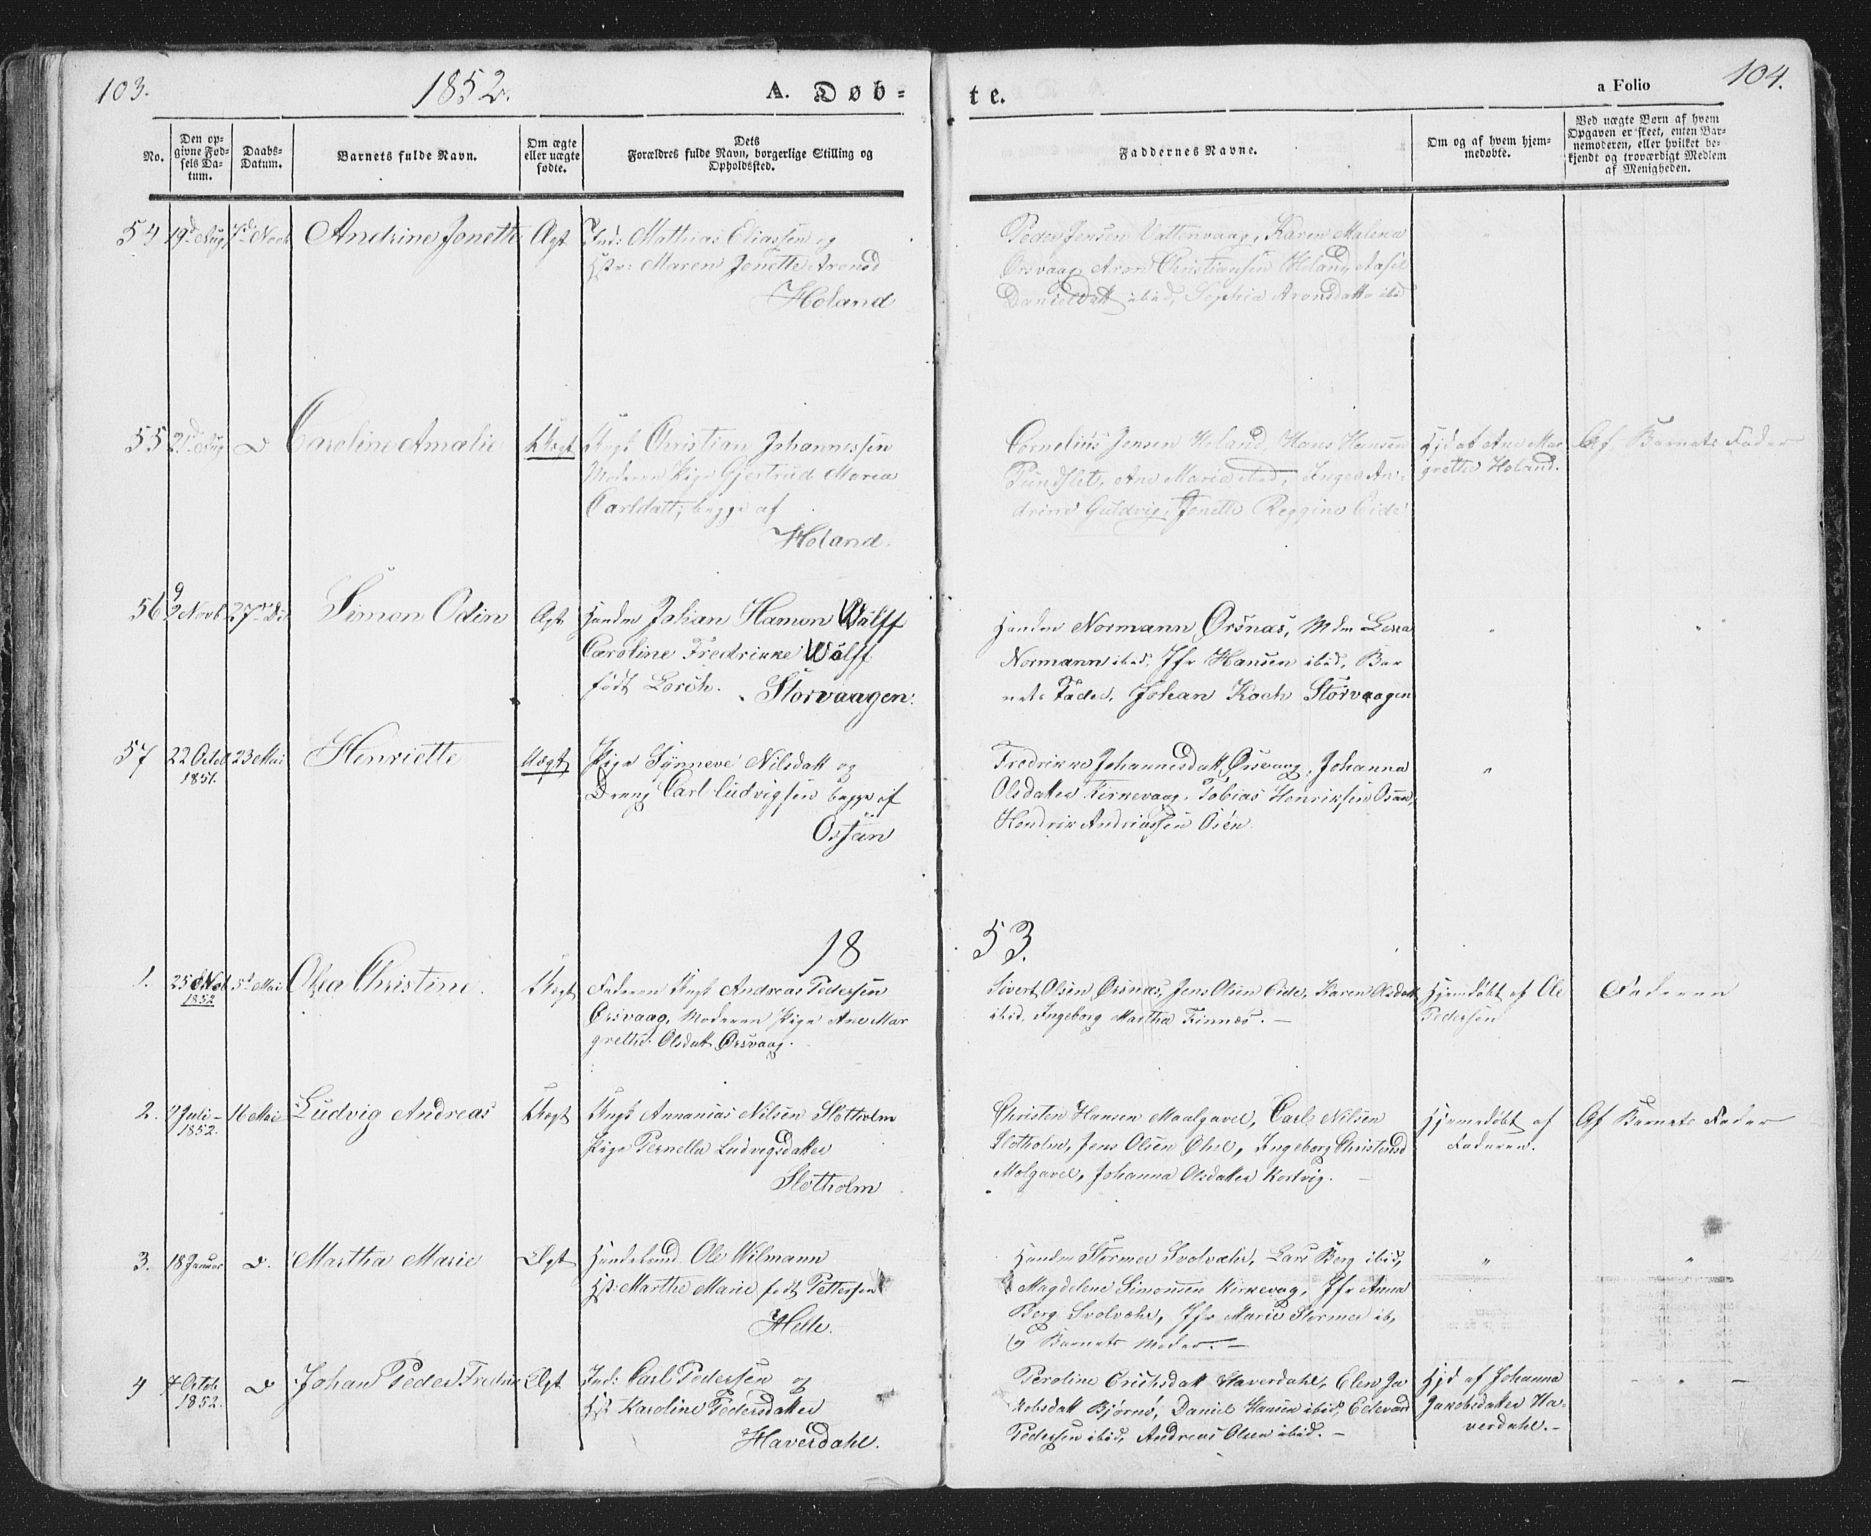 SAT, Ministerialprotokoller, klokkerbøker og fødselsregistre - Nordland, 874/L1072: Klokkerbok nr. 874C01, 1843-1859, s. 103-104